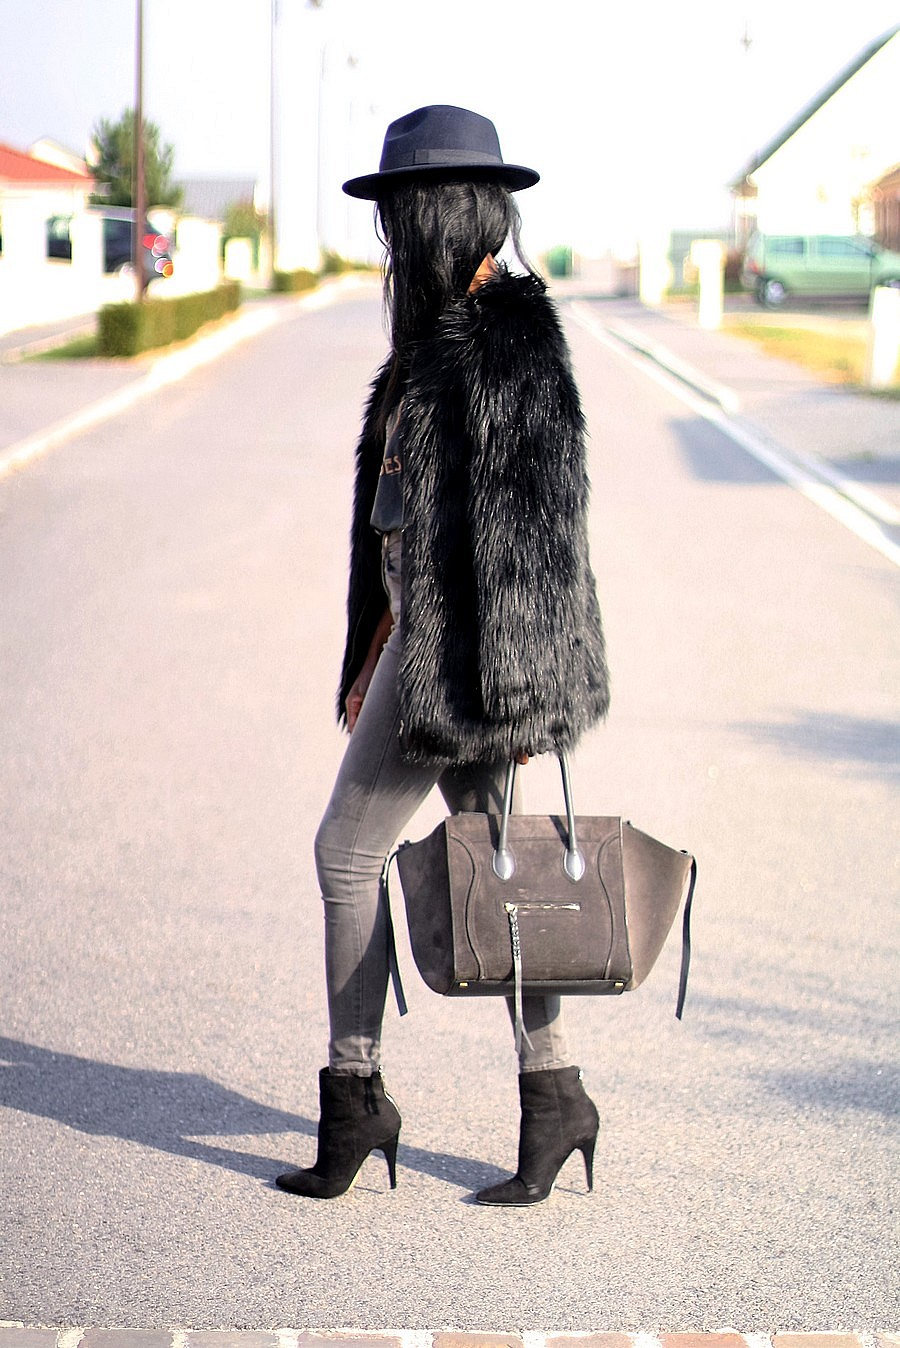 stylee-en-hiver-chapeau-manteau-fourrure-bottines-celine-phantom